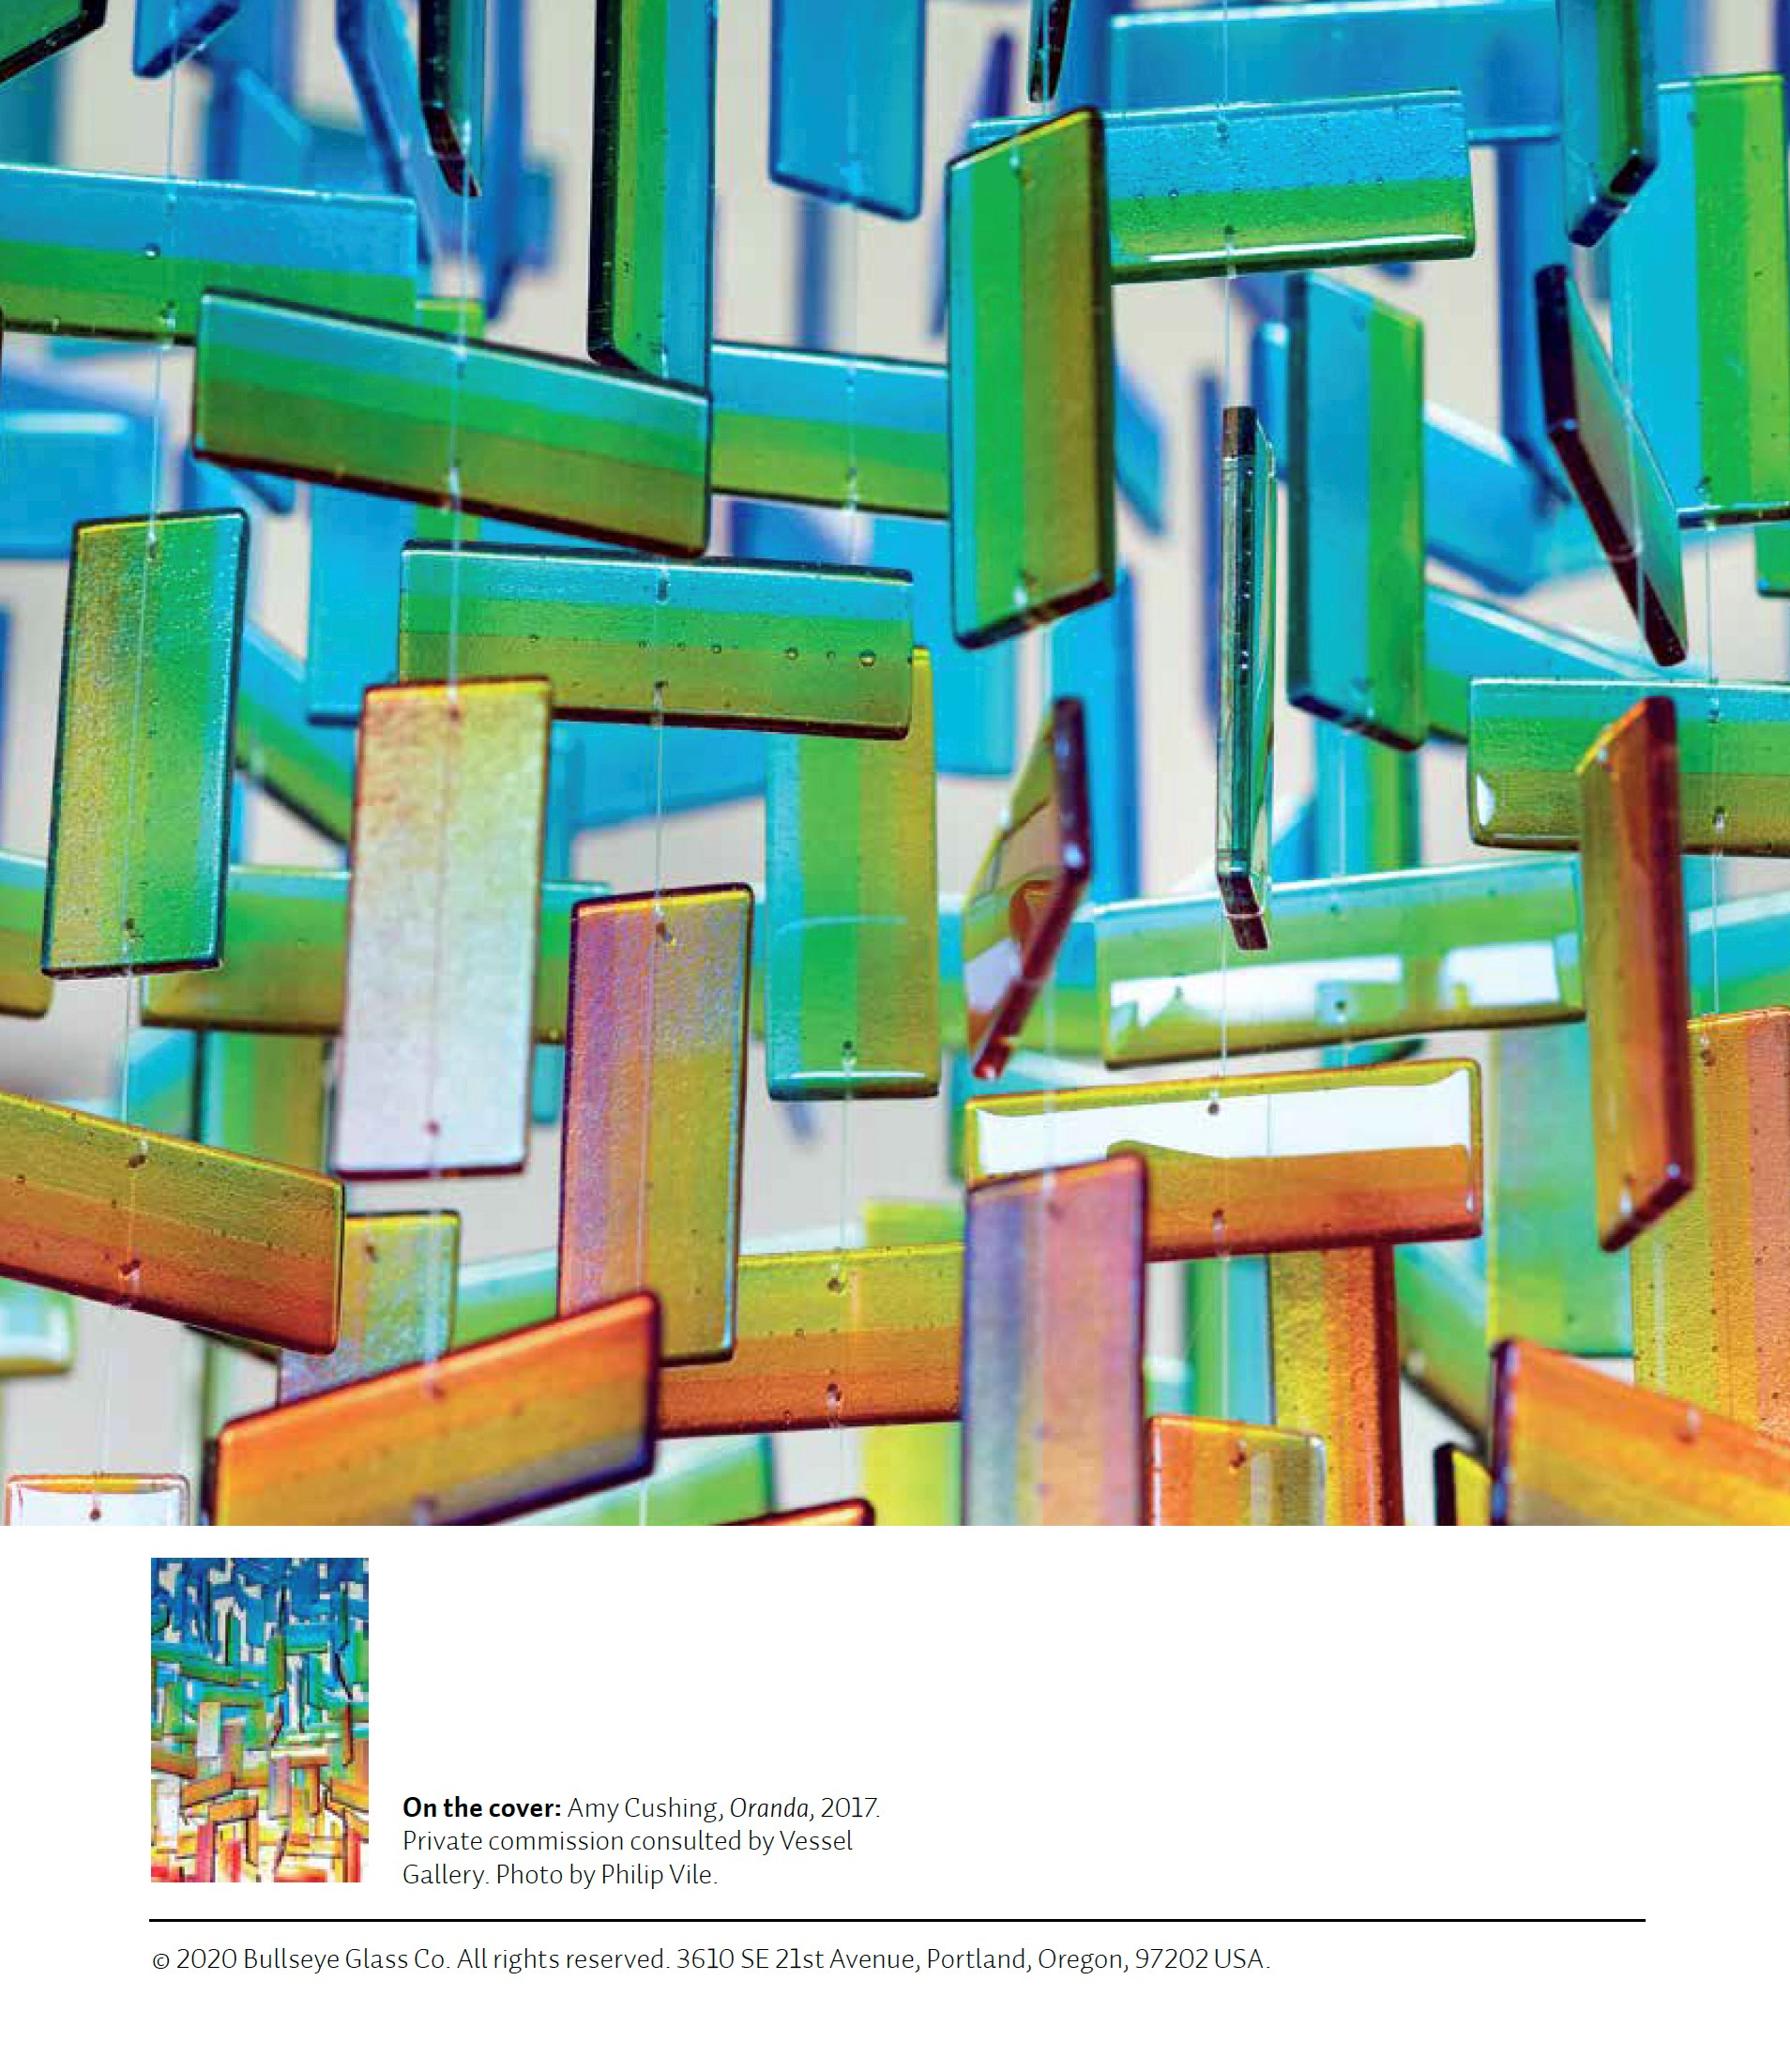 amy cushing colourful hanging glass art bright and joyful